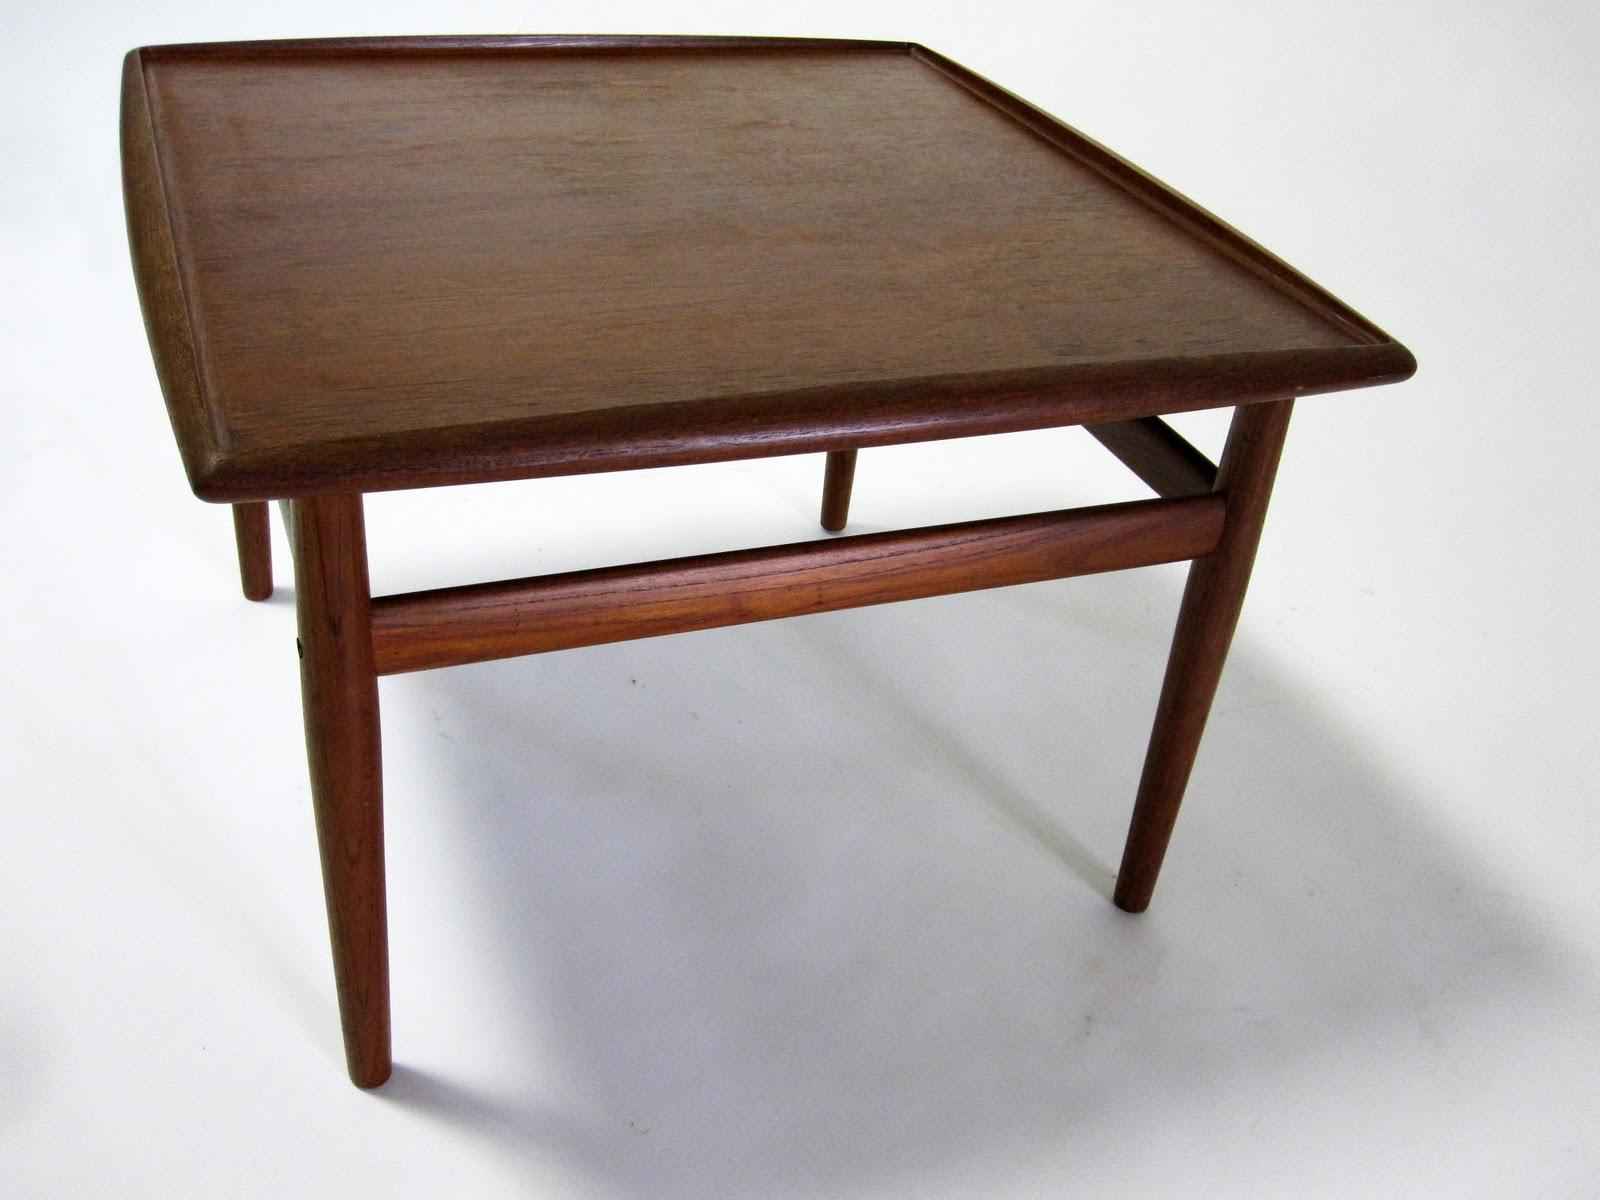 Circa Midcentury Danish Modern Side Or Coffee Table